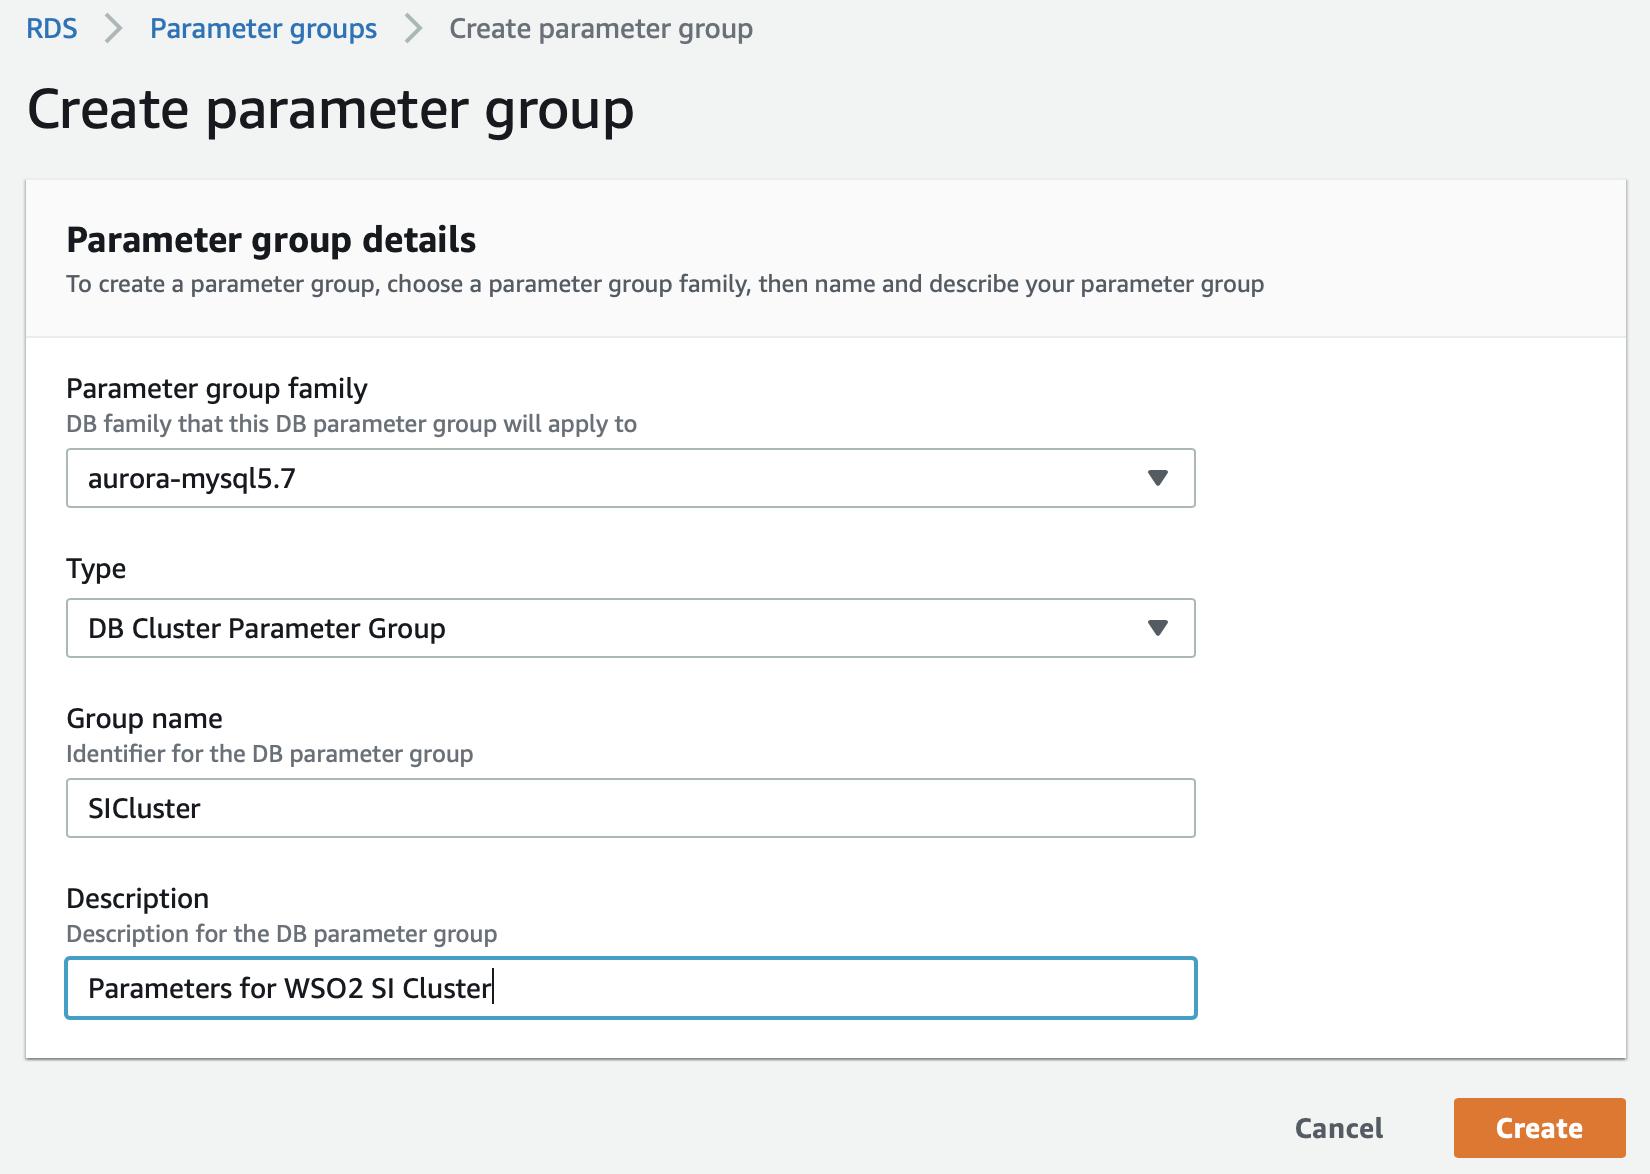 Create New Parameter Group